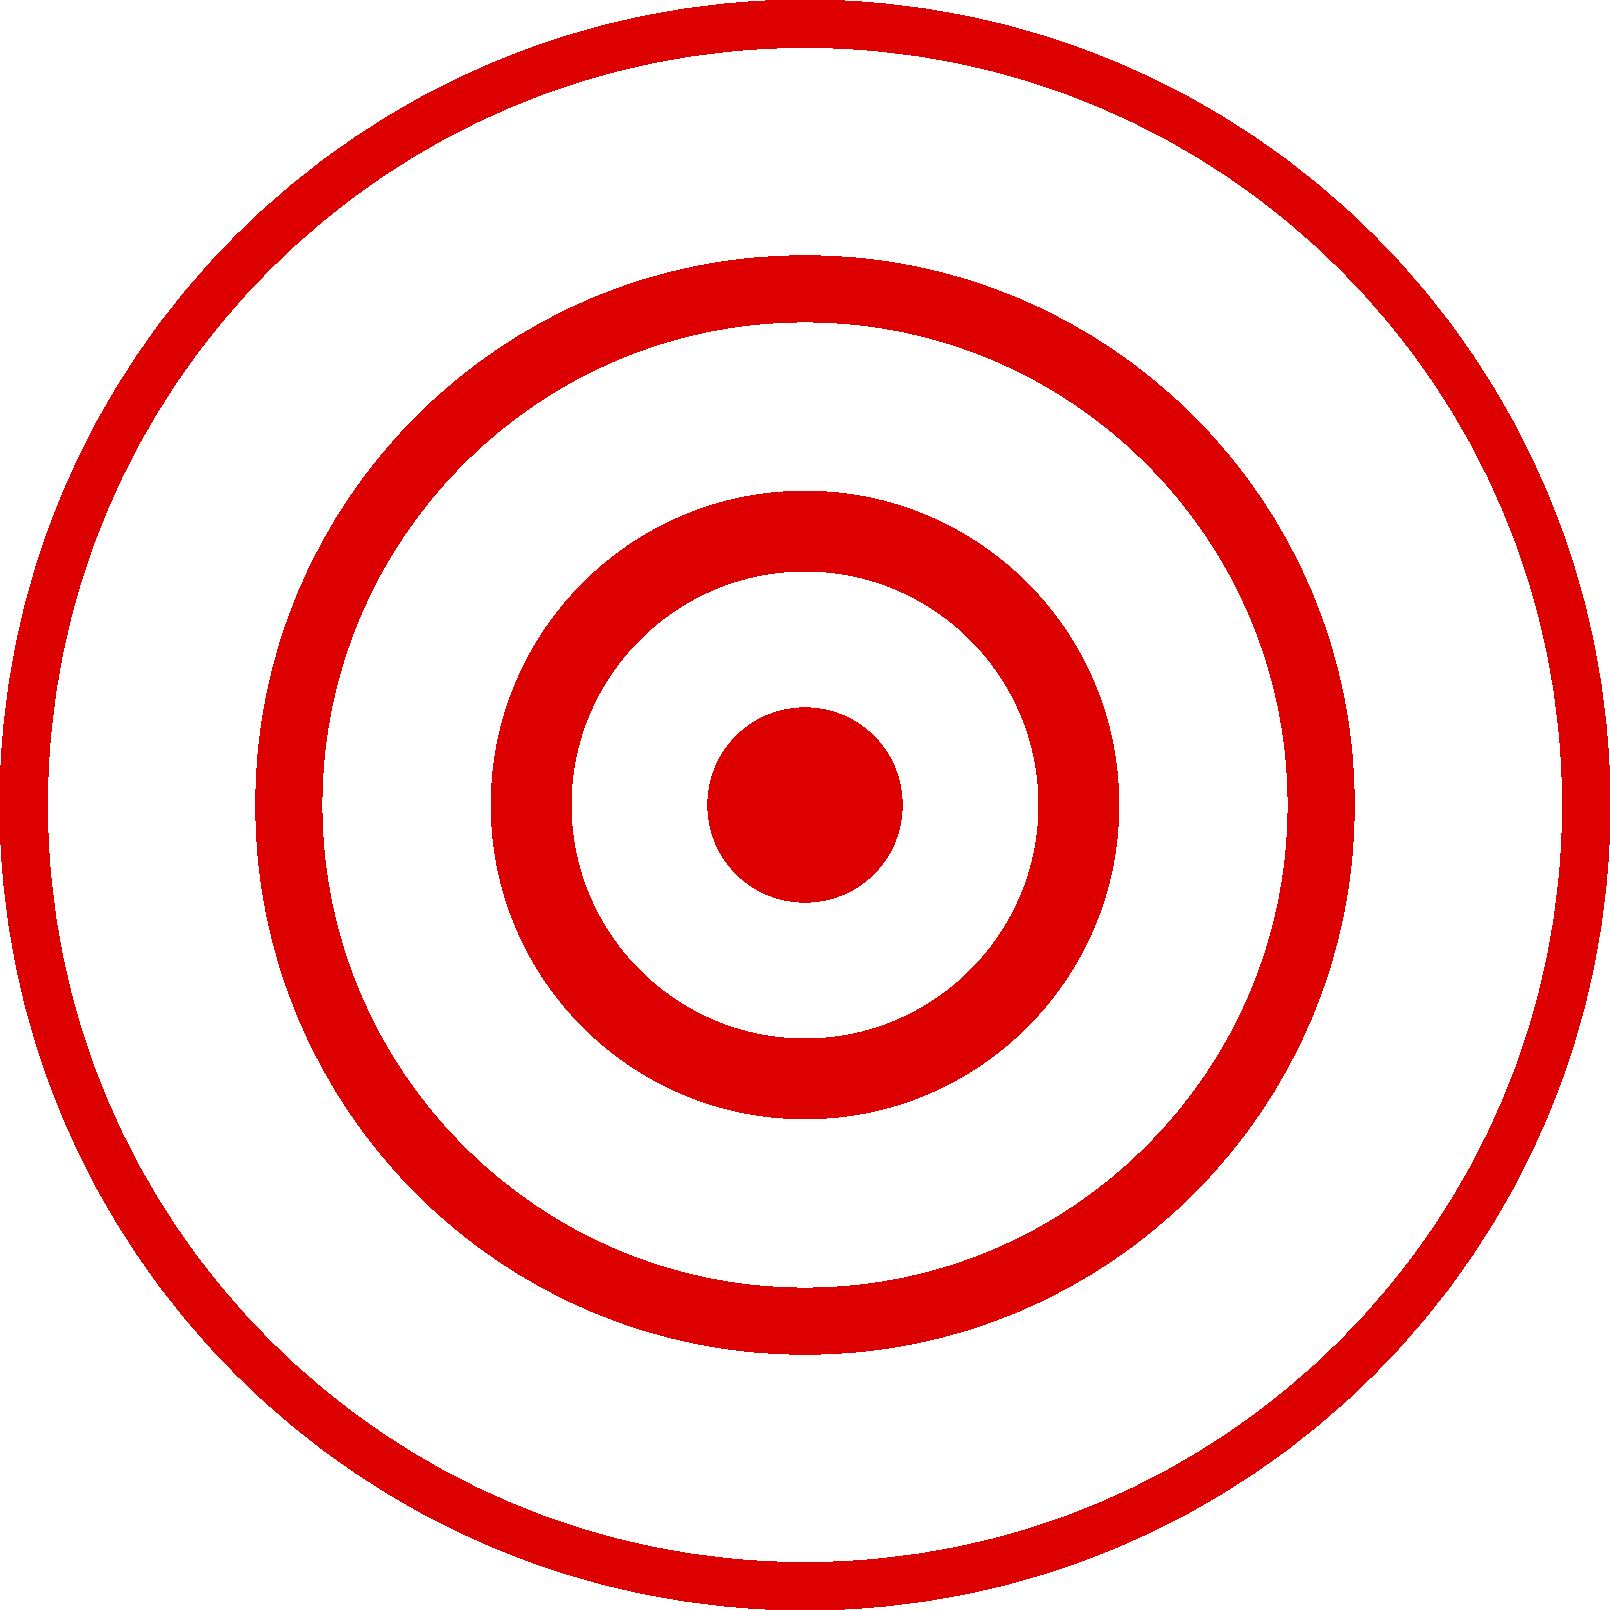 Clipart Kid target BBCpersian7 Clipart